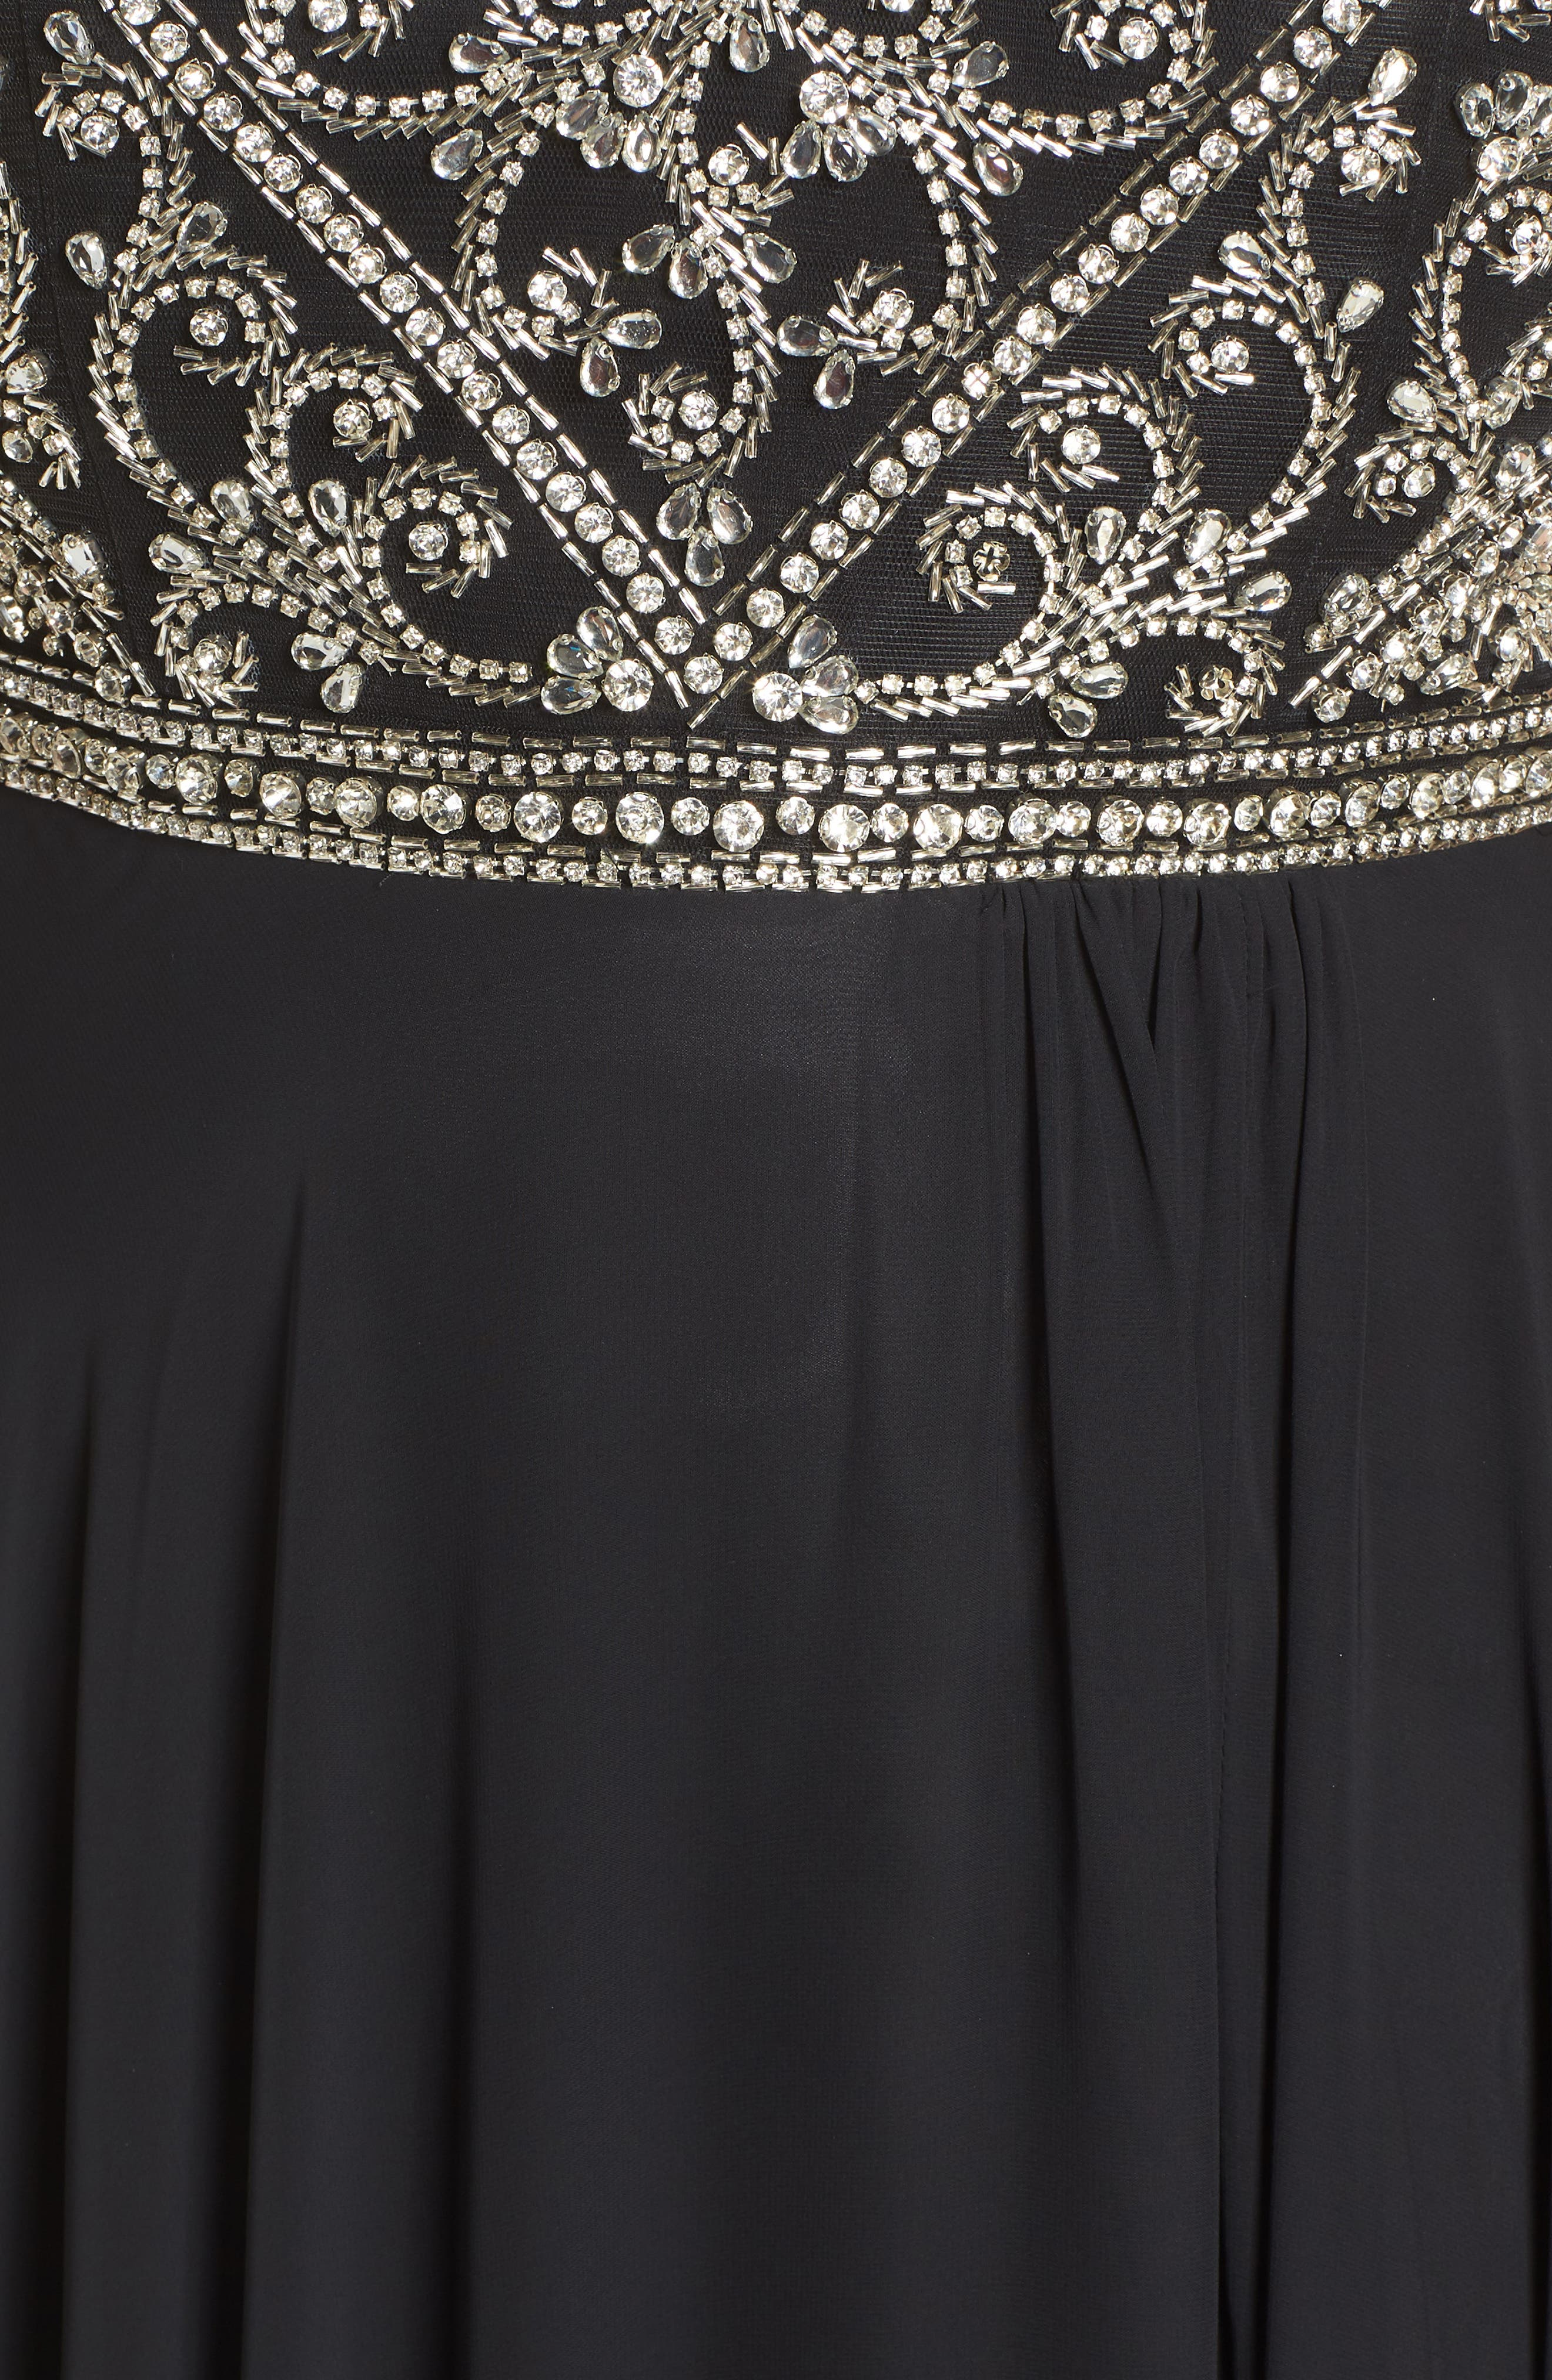 MAC DUGGAL, Embellished Bodice Evening Dress, Alternate thumbnail 6, color, BLACK